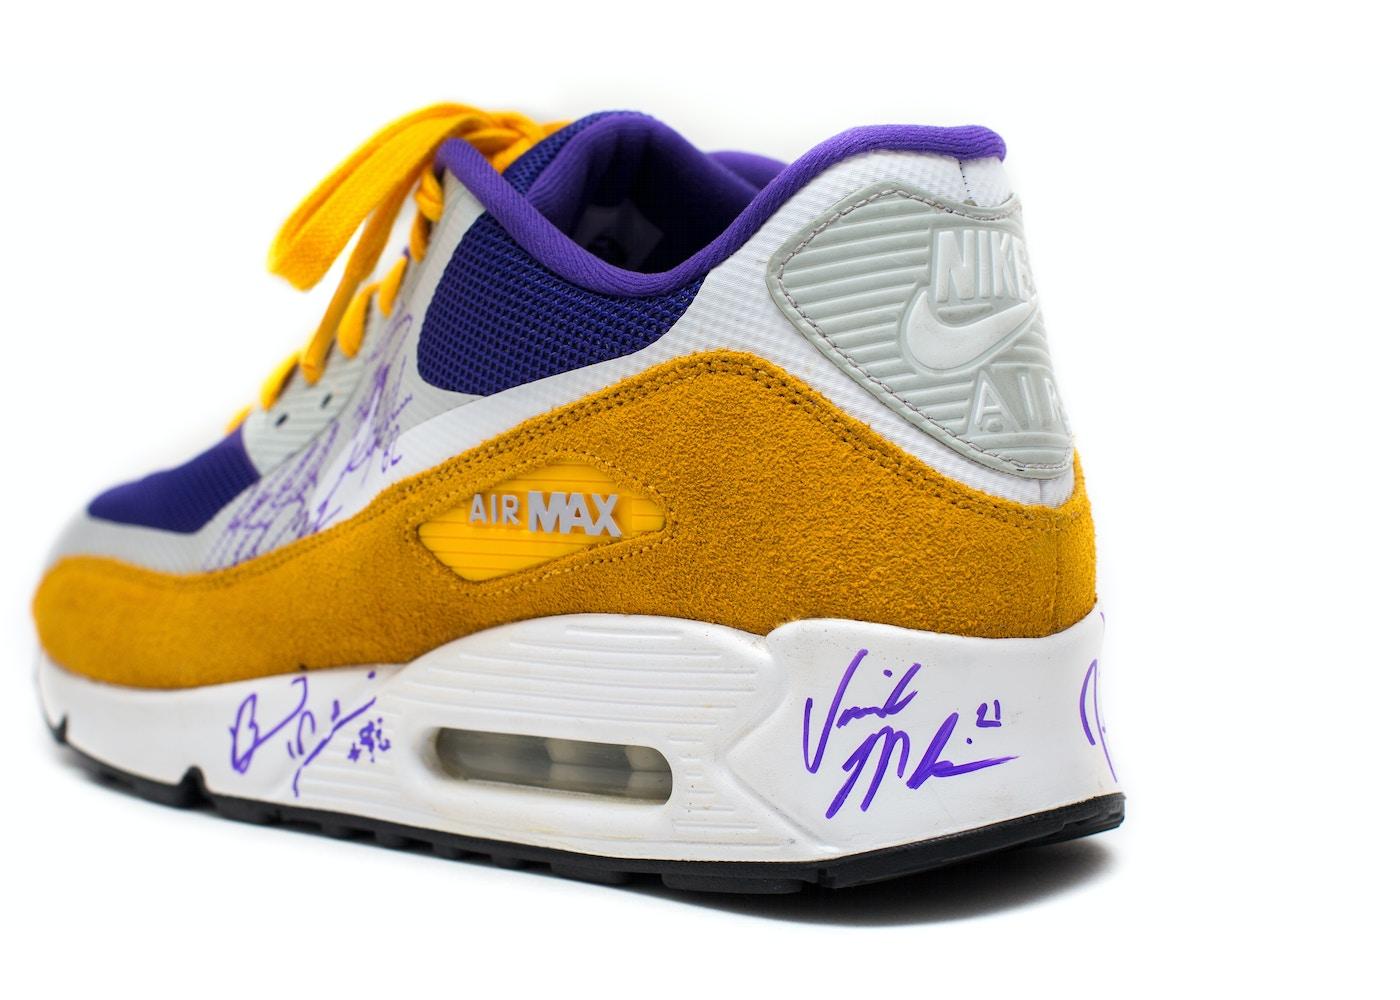 official photos d1498 7f7fd Nike Air Max 90 Minnesota Vikings Signed (sz 12)